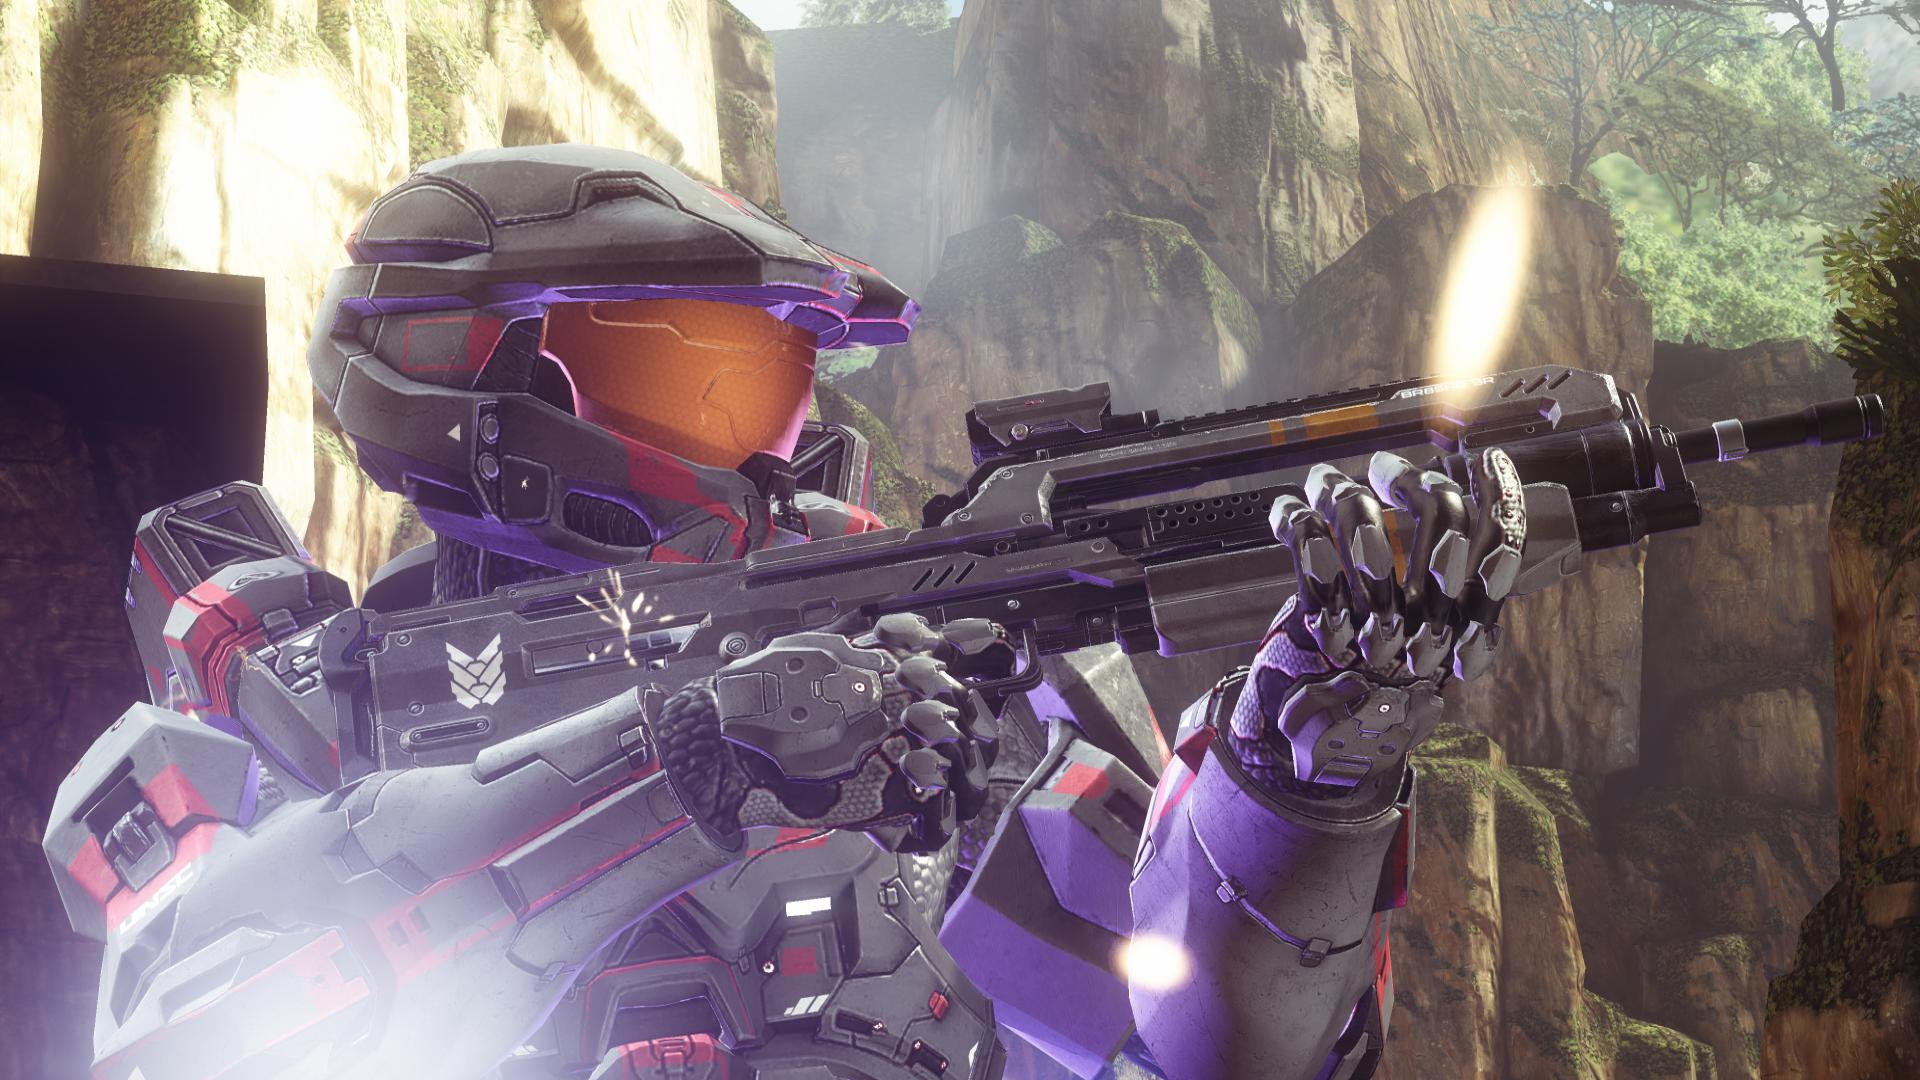 HaloTracker: Halo 4, Halo Reach Stats, Challenges